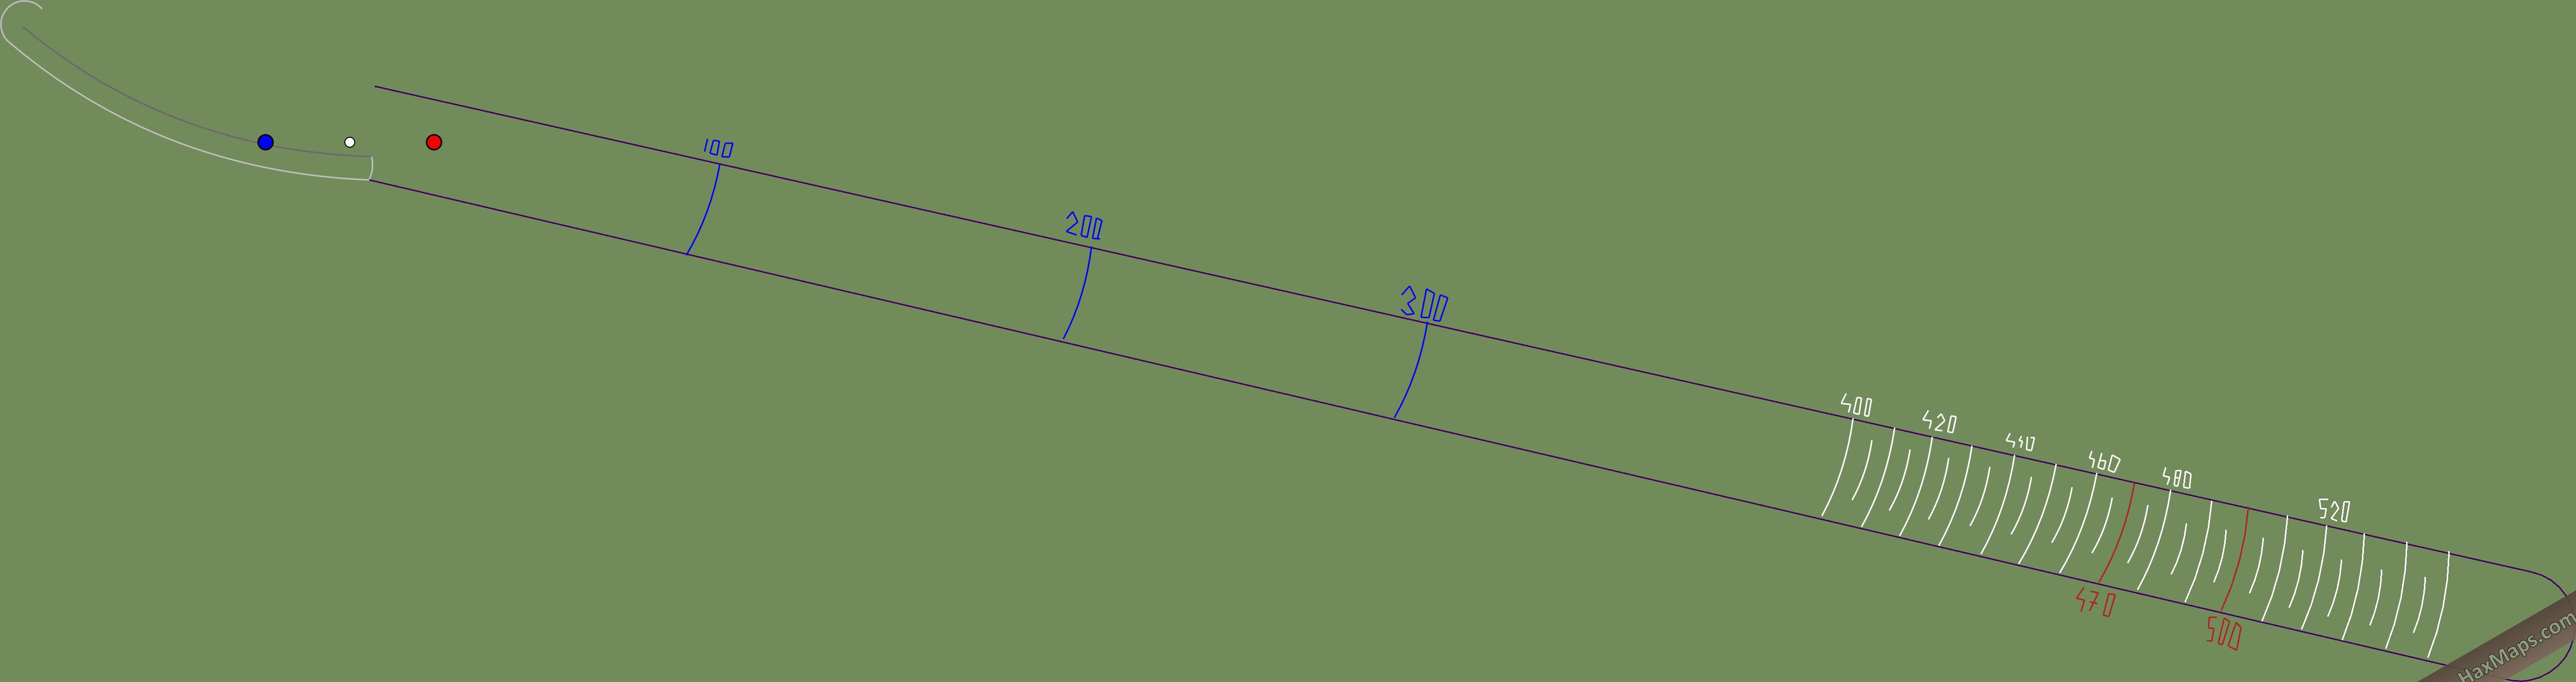 hax ball maps | Skocznia im Wysp S v_1